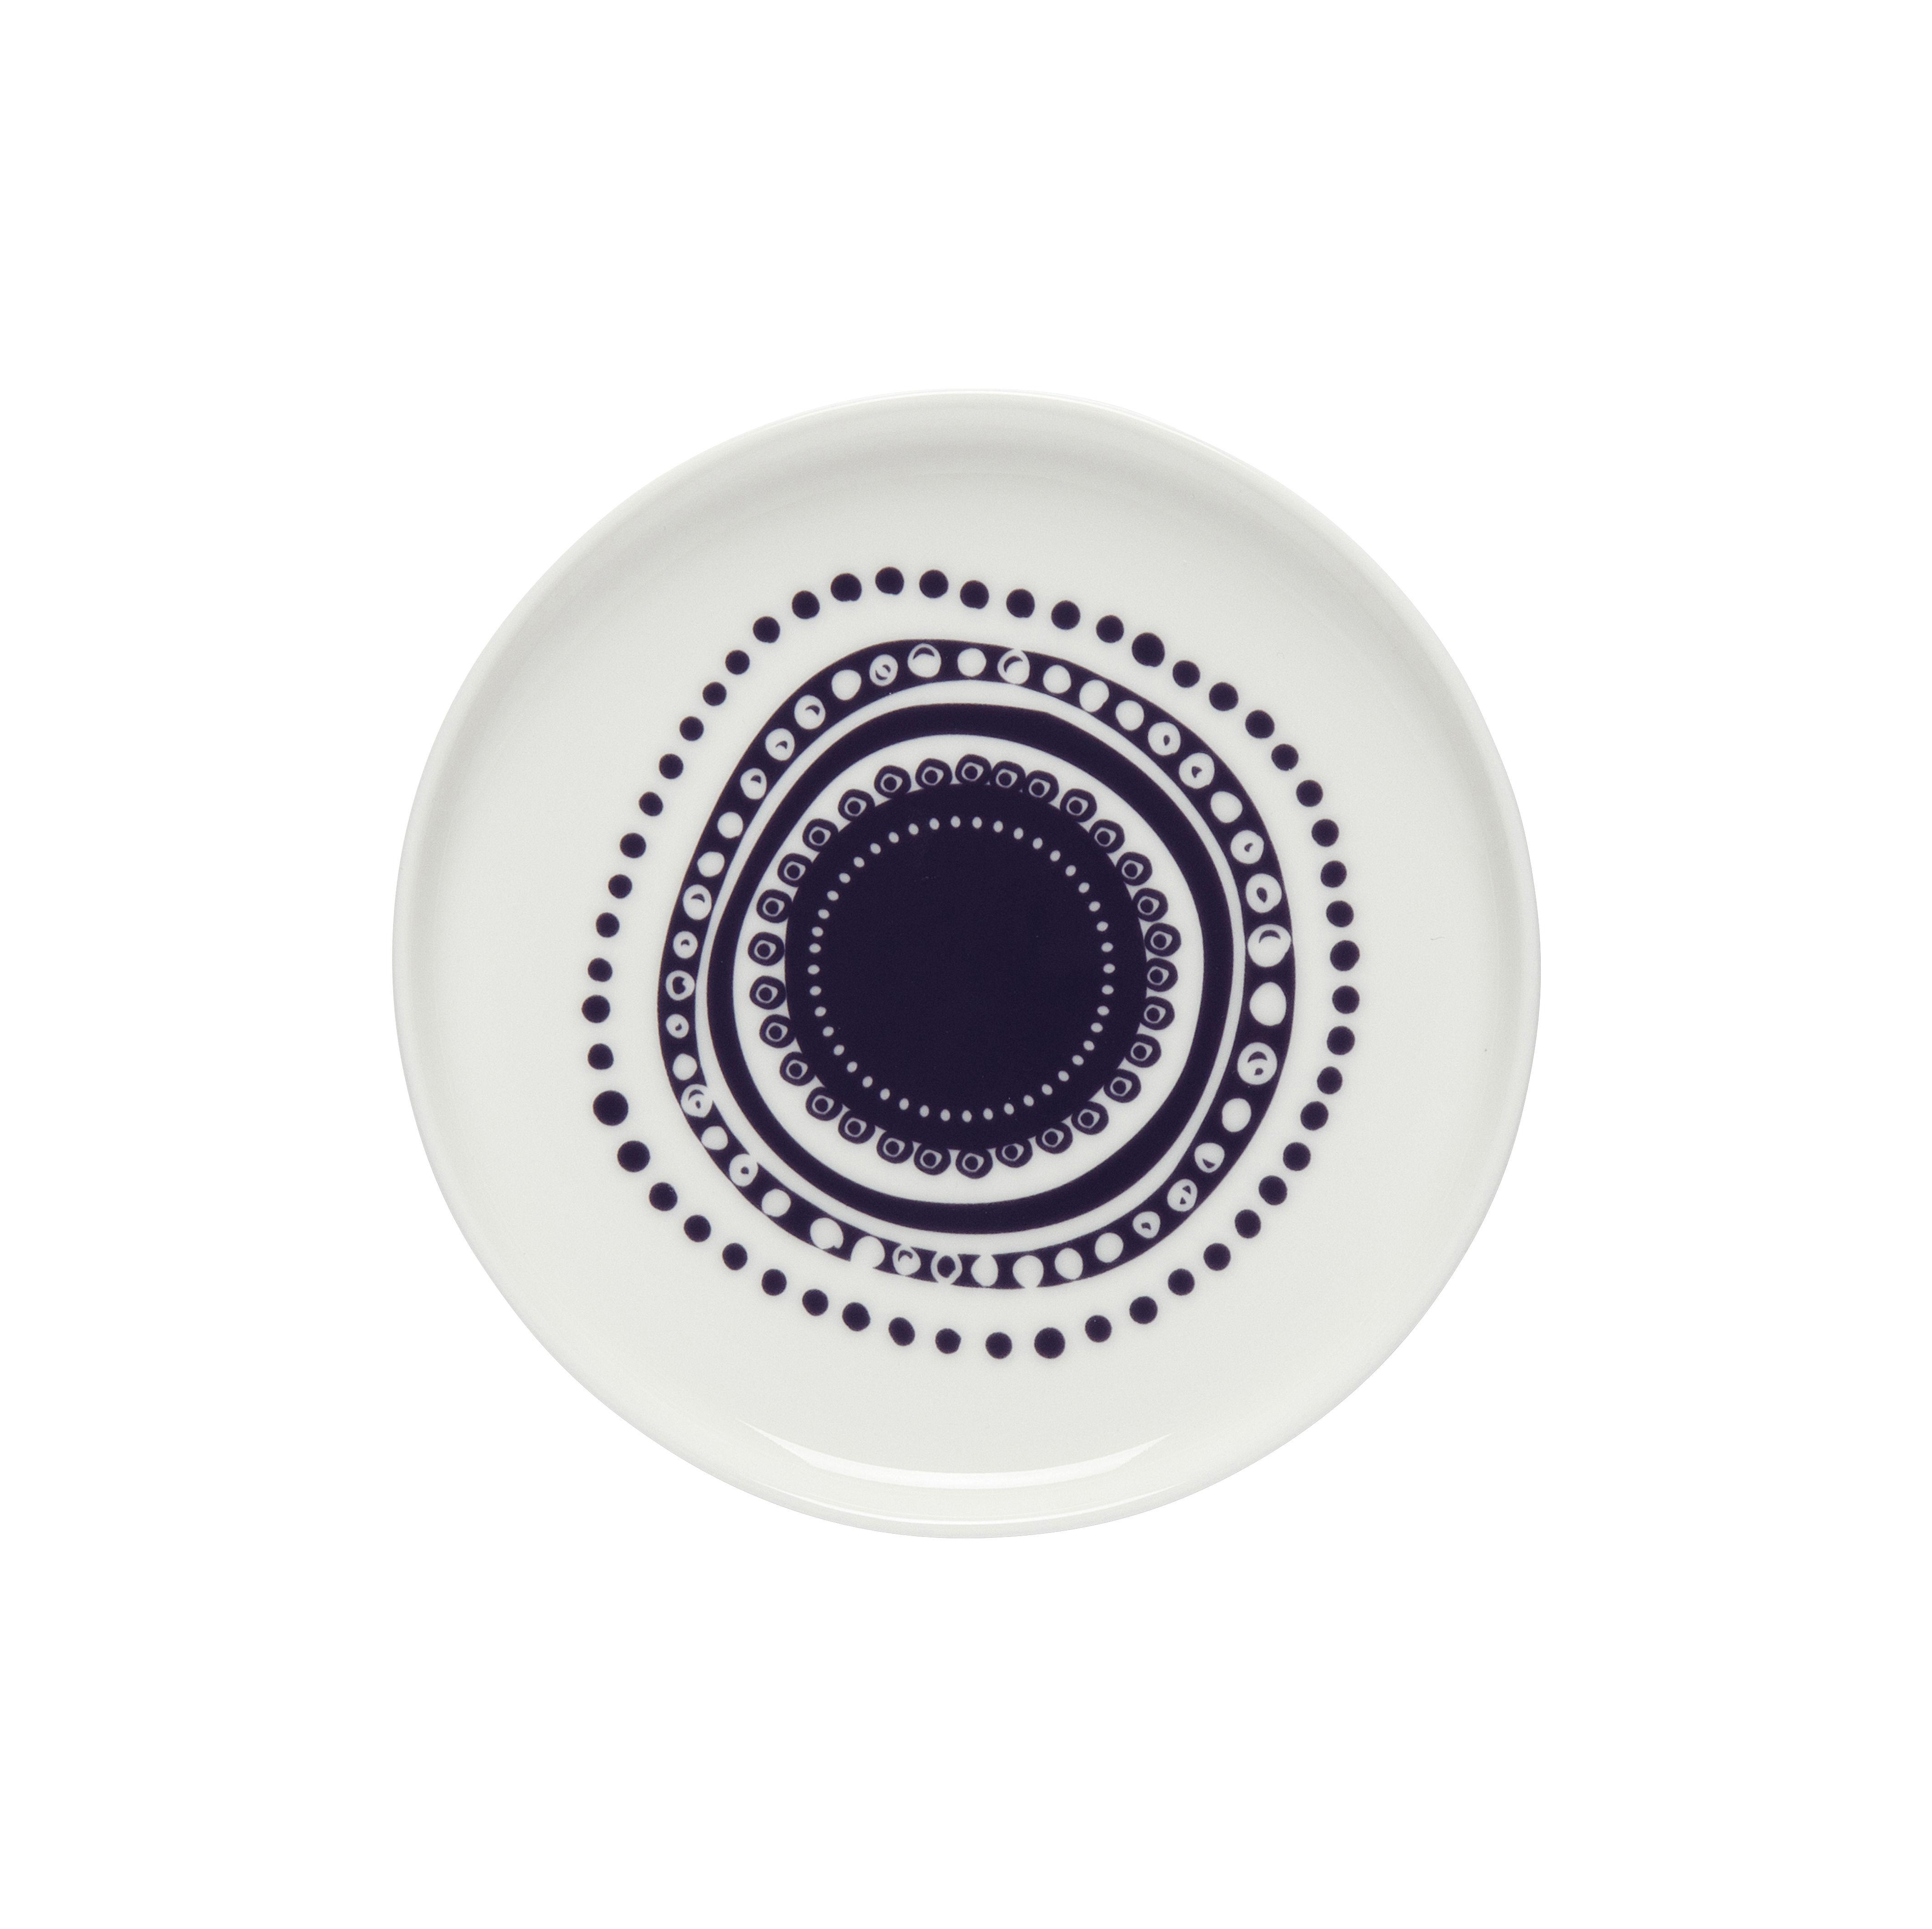 Tavola - Piatti  - Piatto per dolcetti Svaale - / Ø 13,5 cm di Marimekko - Svaale / viola - Gres